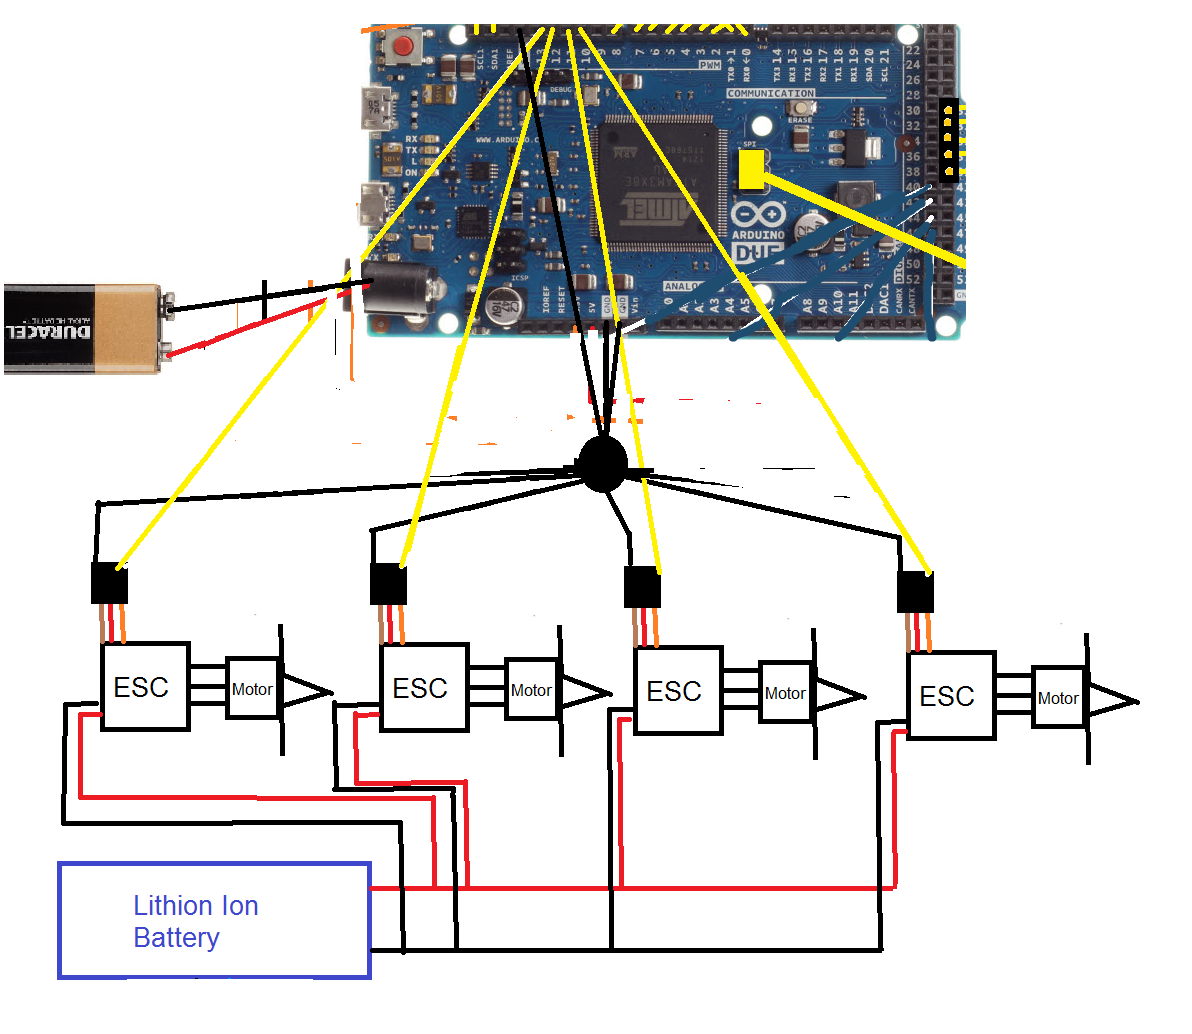 Quadcopter Schematic Diagram Push Pull Wiring Design Part 3 Esc And Motor Code